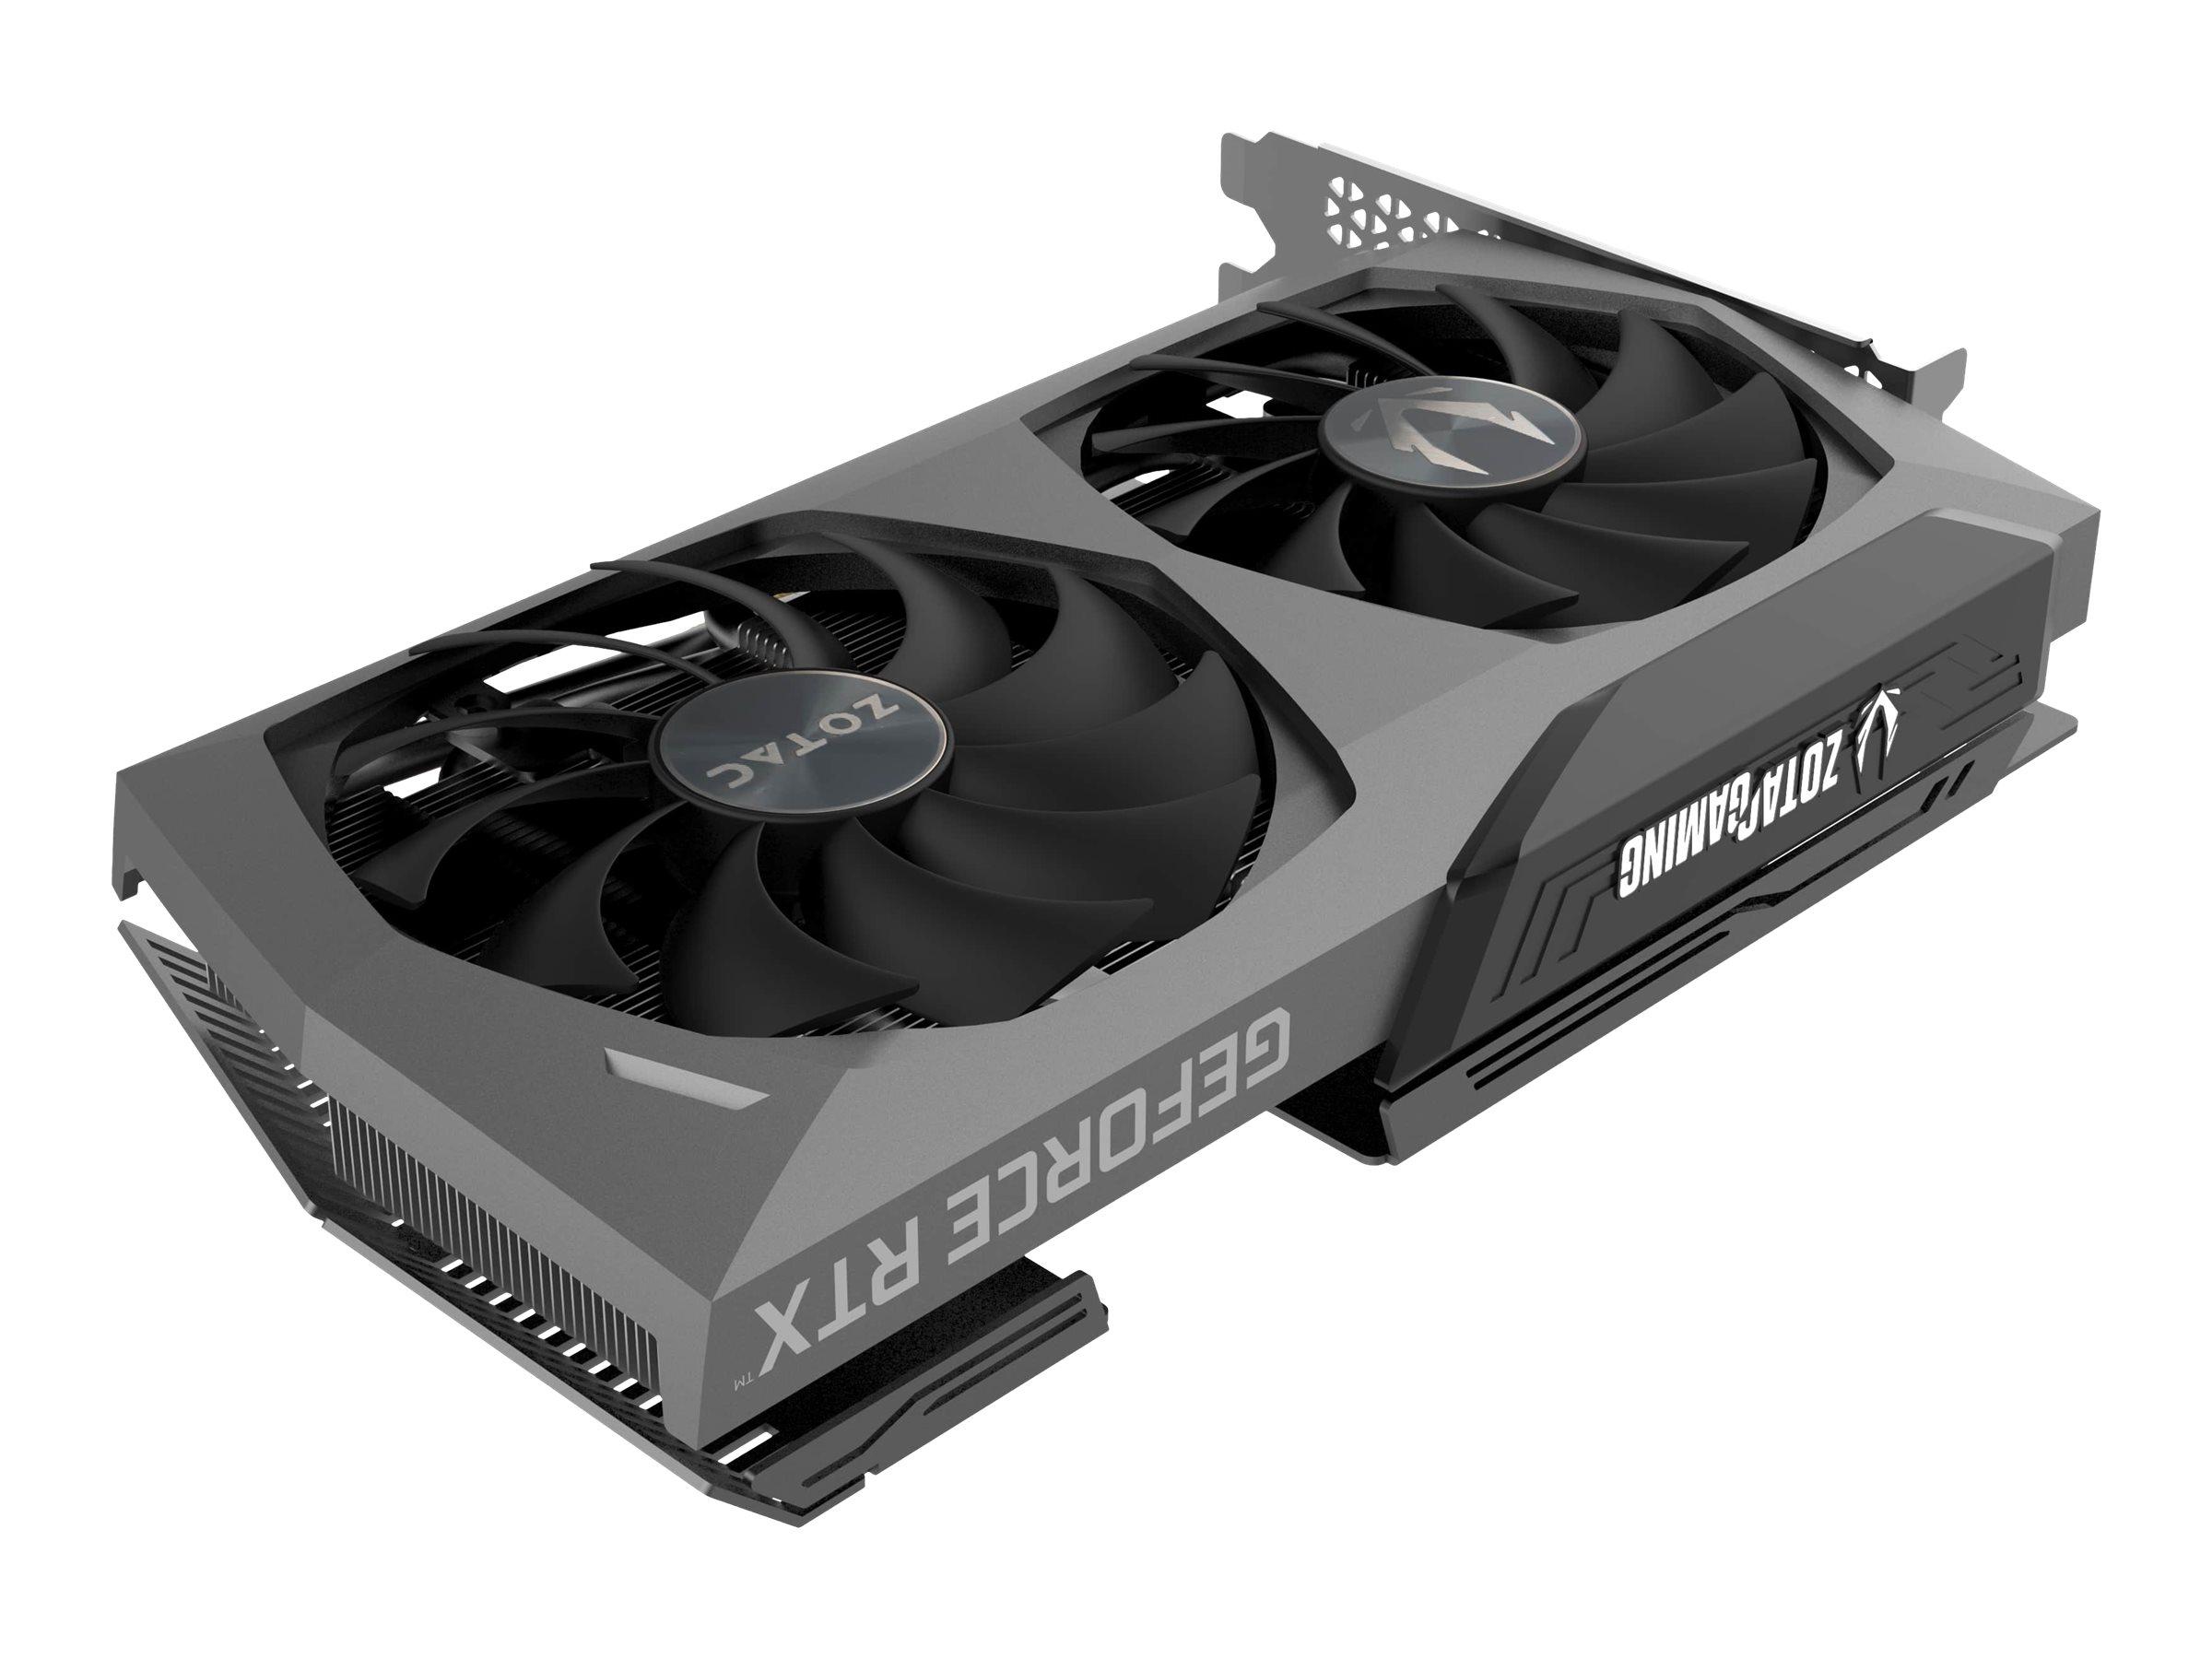 ZOTAC GAMING GeForce RTX 3070 Twin Edge - Grafikkarten